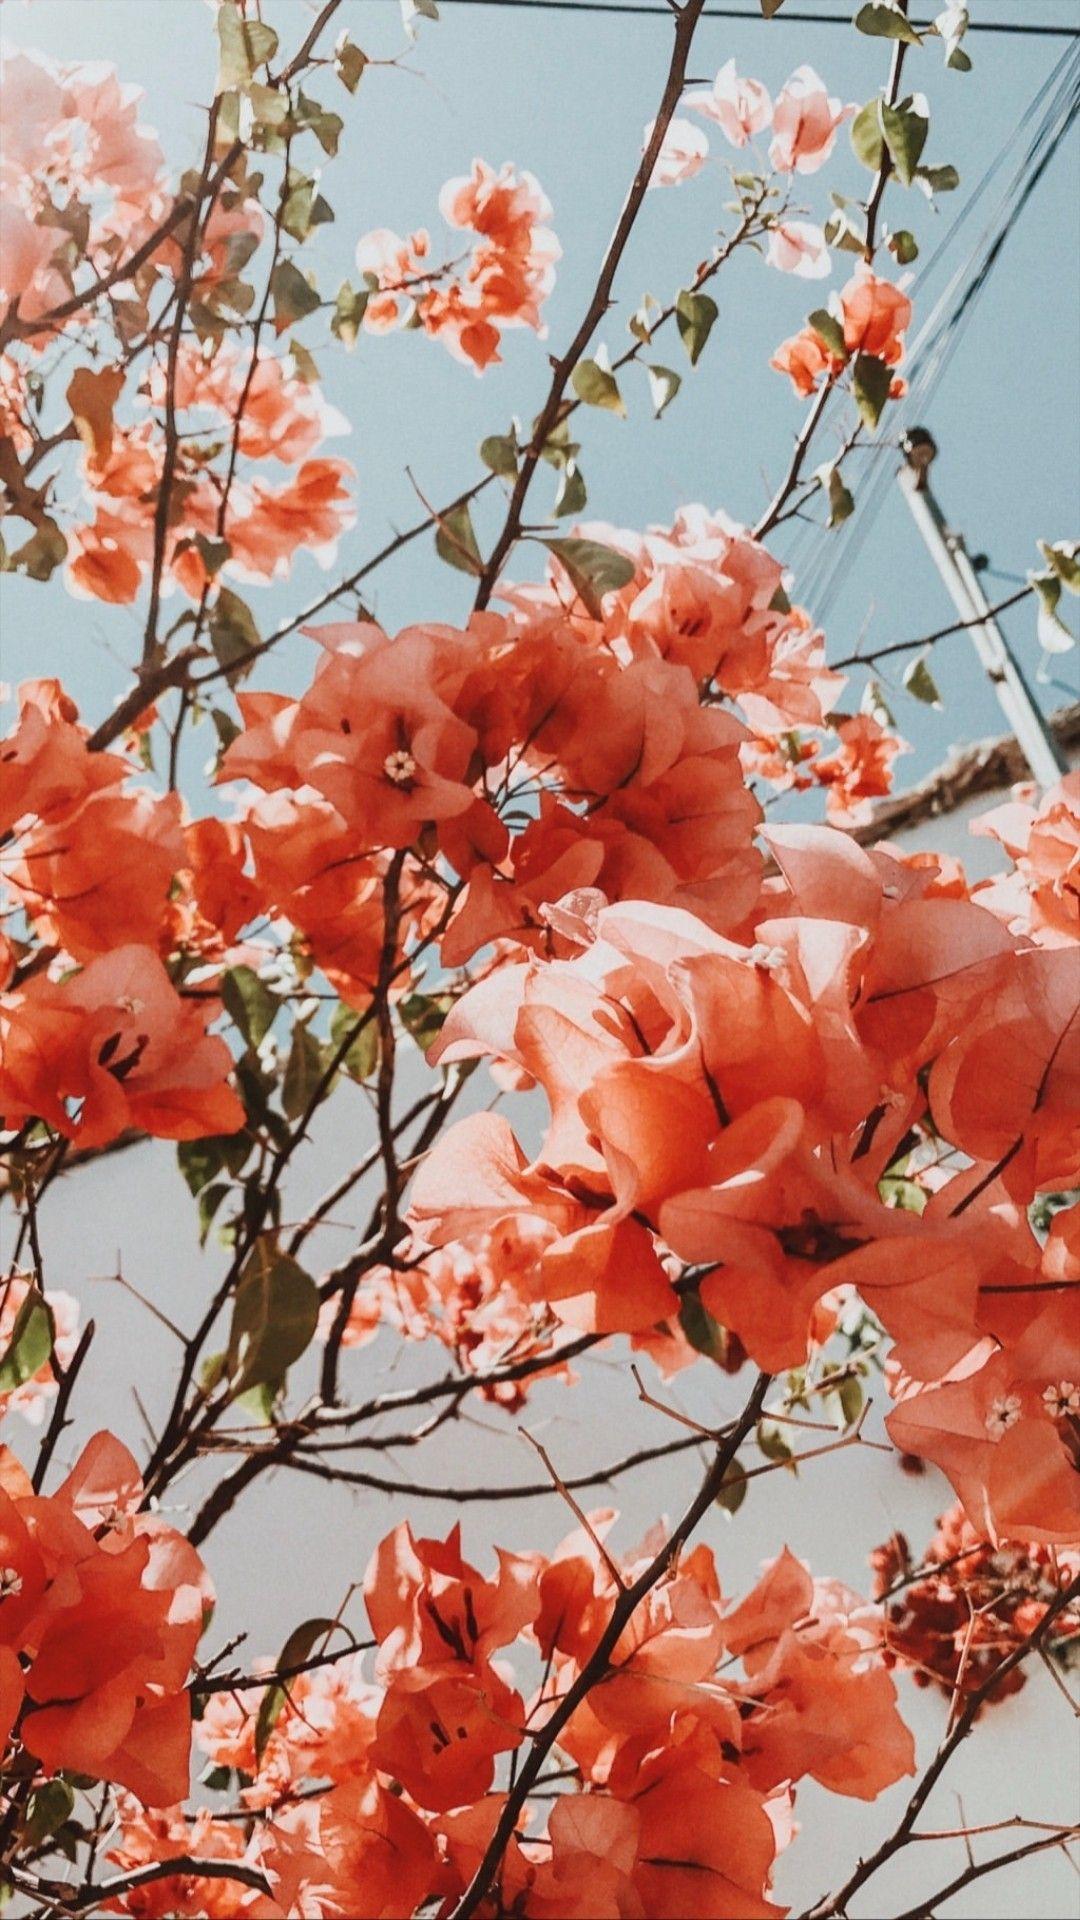 Aadyalicious In 2019 Flower Iphone Wallpaper Flower